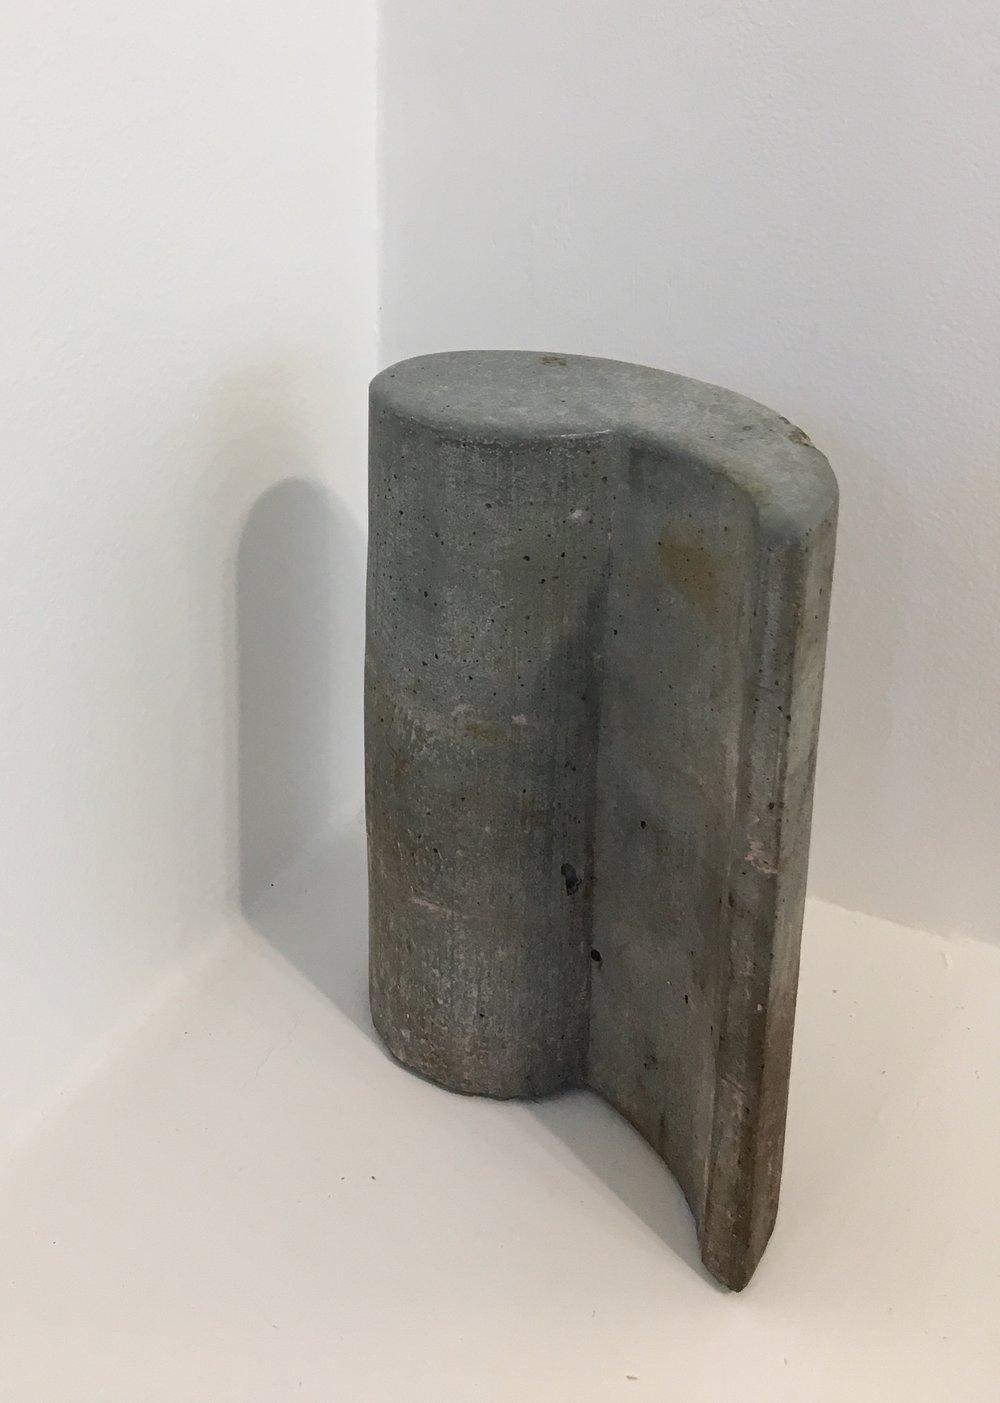 "Laura Kaufman, ""Rose Comma"", 2012/2018. Concrete, soil. 7x5.5x3 in."